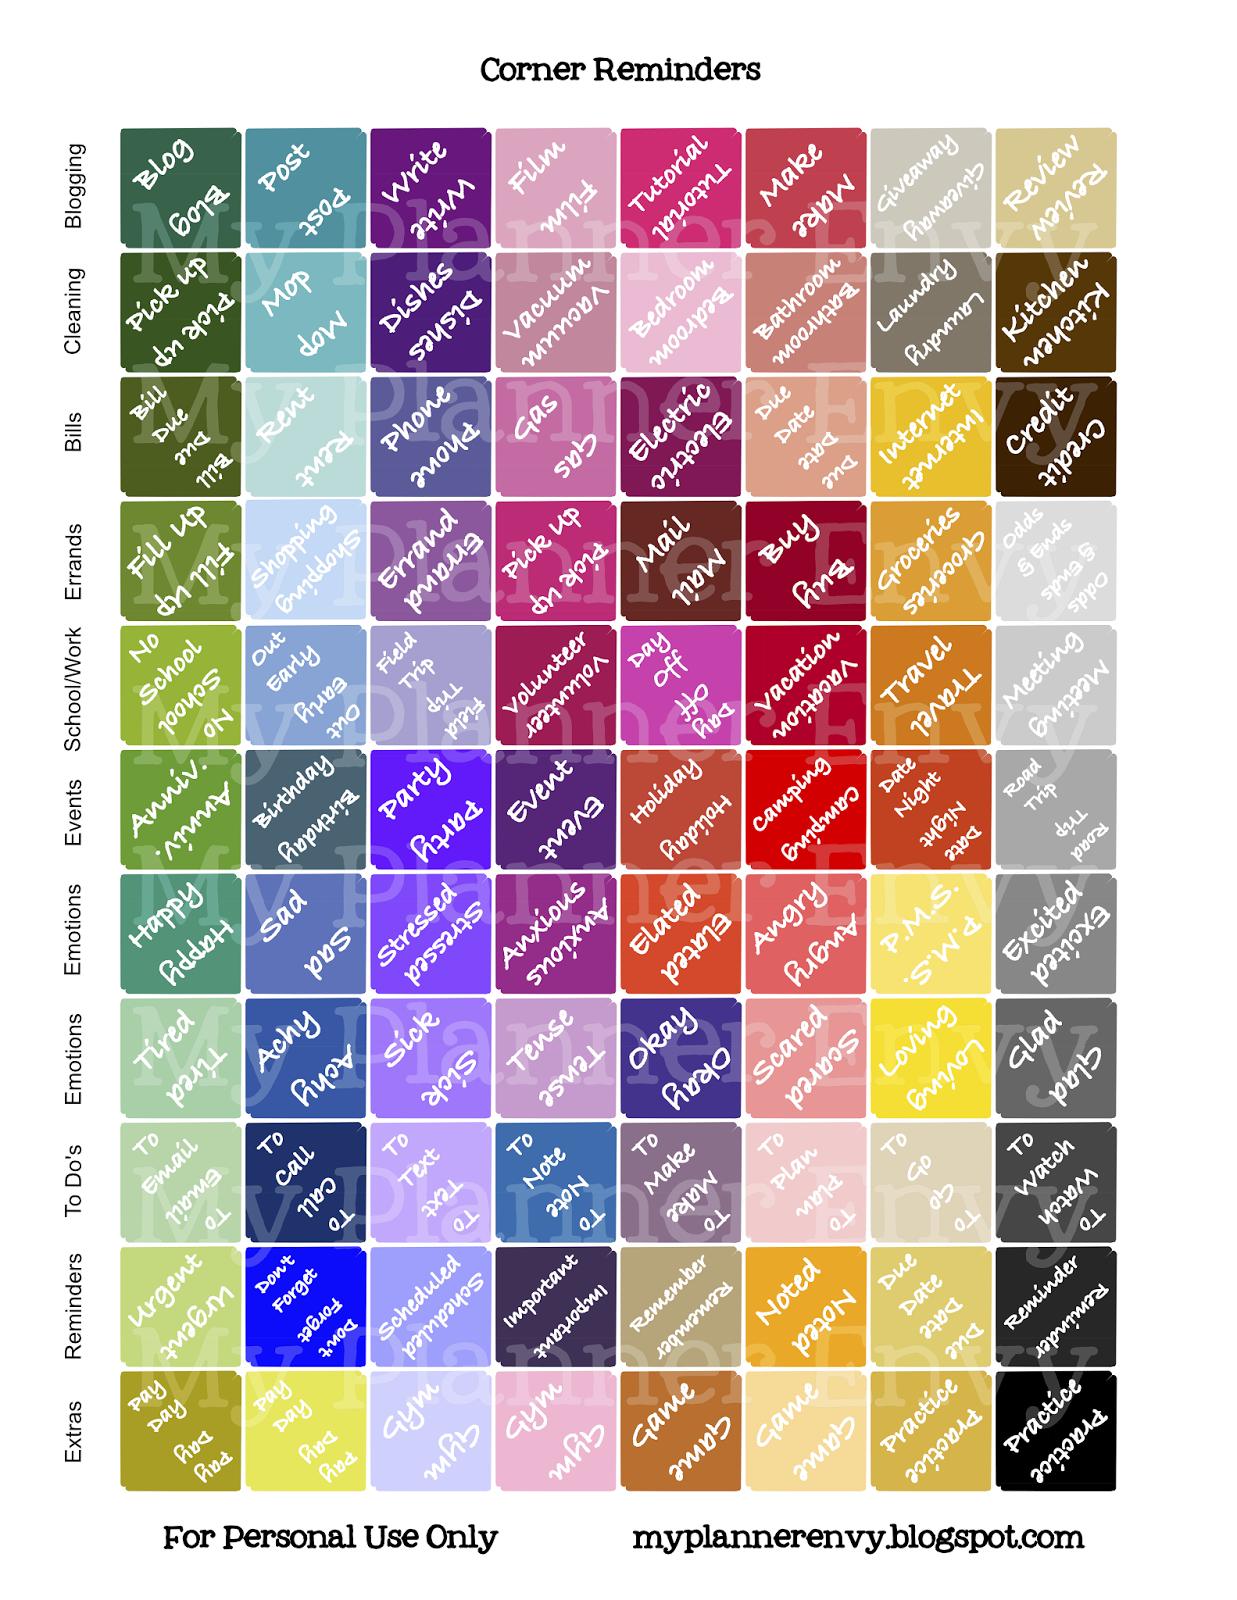 Calendar Planner Reminder Stickers : Corner reminder stickers free printable planner